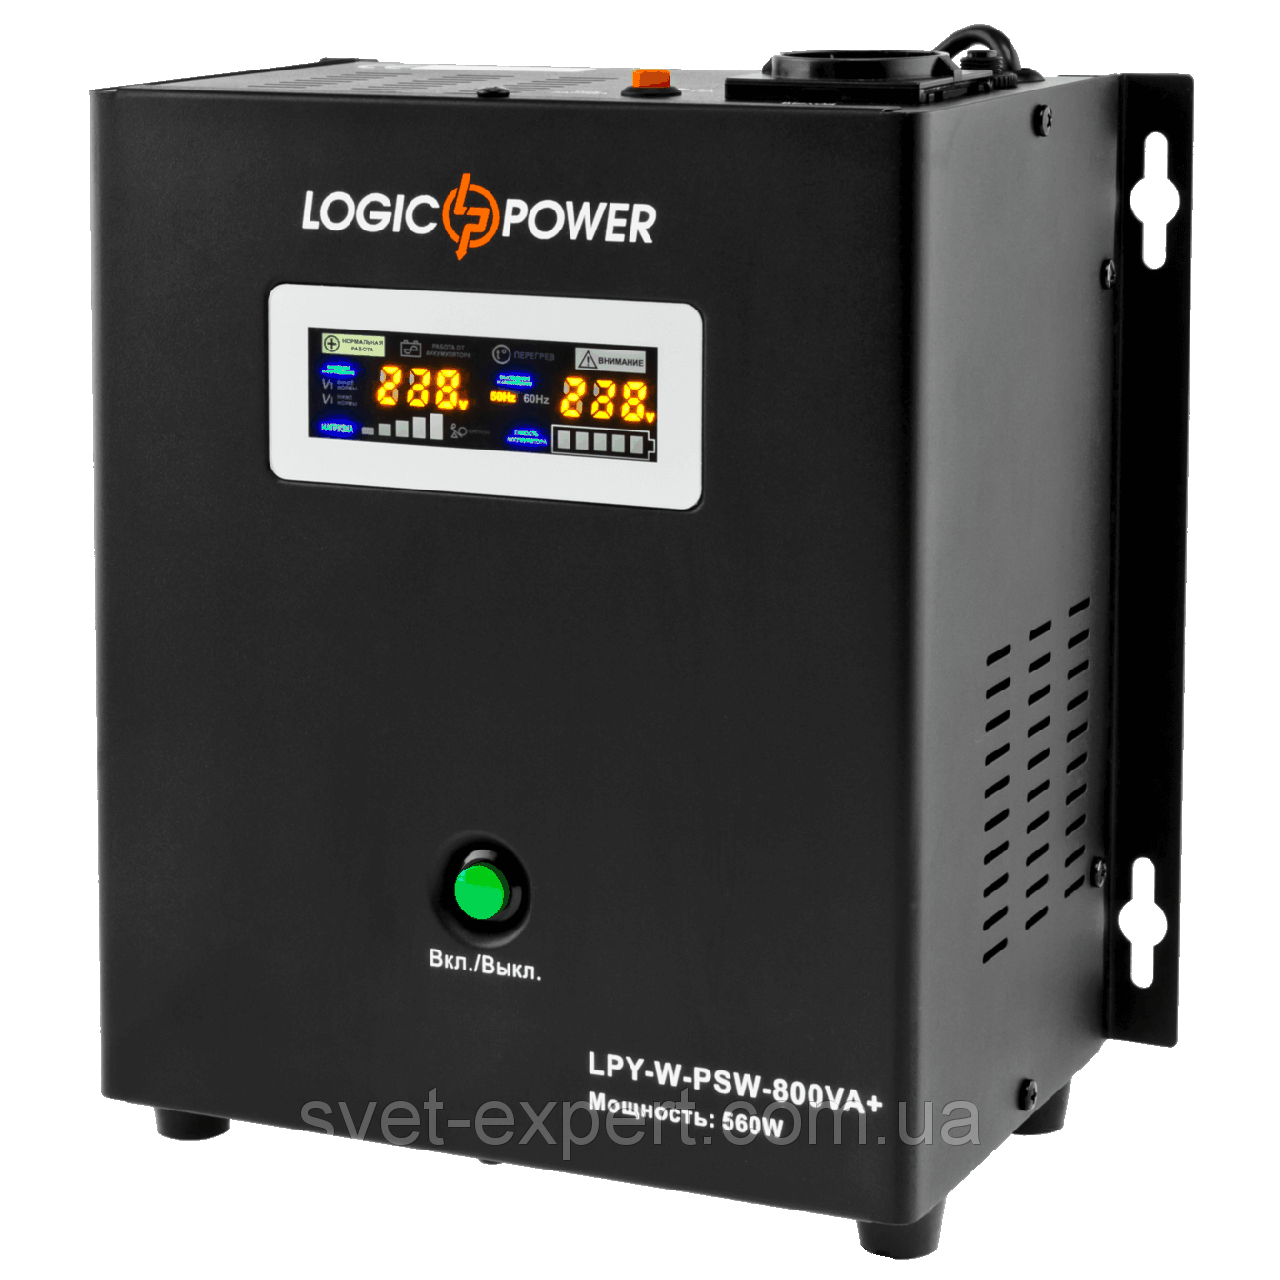 LPY- W - PSW-800VA + (560Вт) 5A/15A 12В